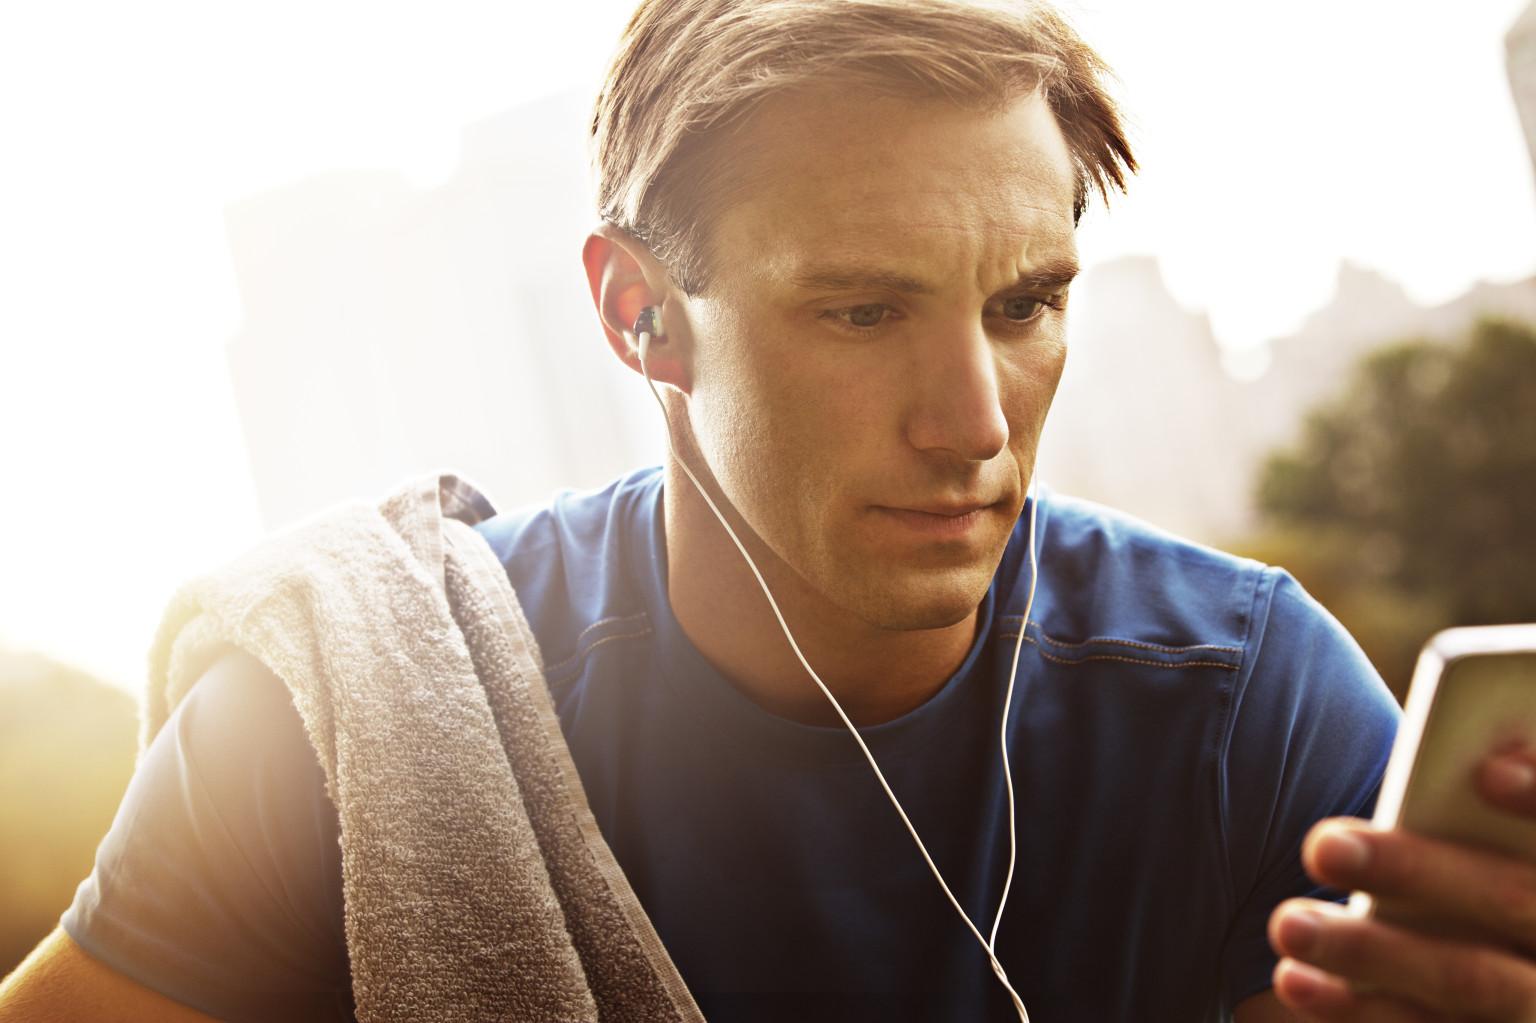 playlist para atividades físicas